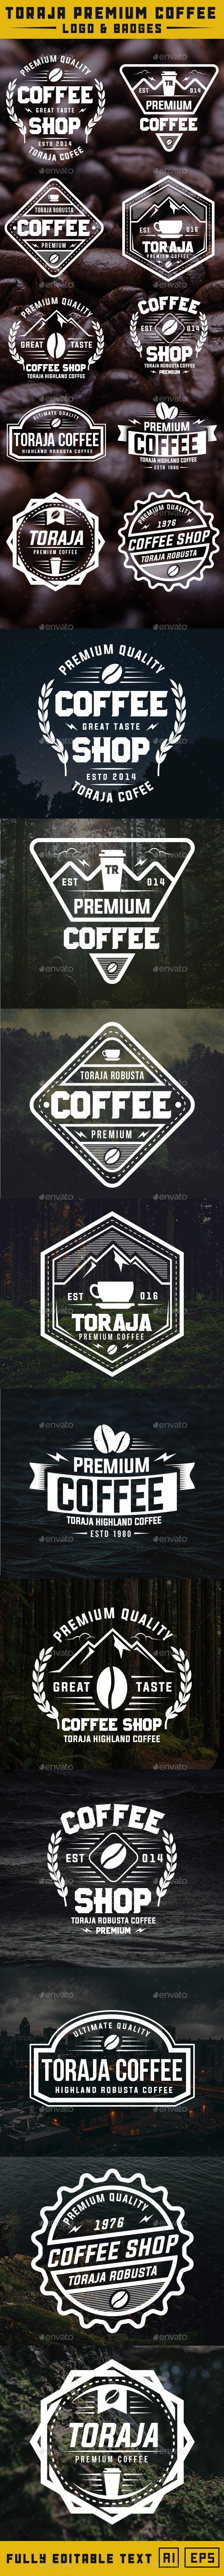 Toraja Premium Coffee Logo & Badges - #Badges & Stickers Web Elements